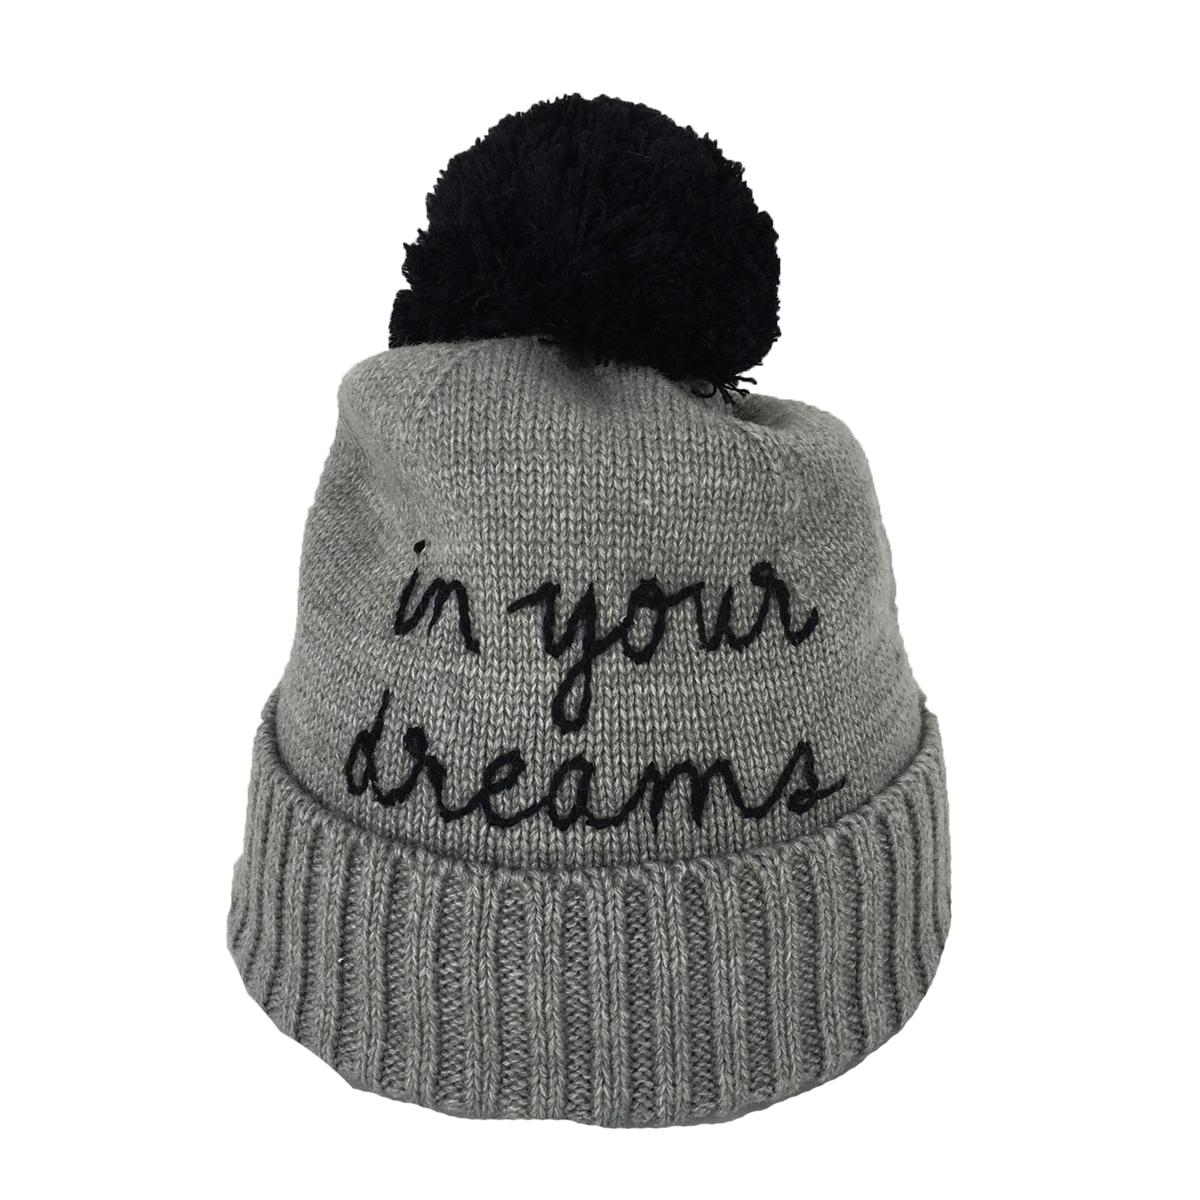 095a1623db7 Kate Spade In Your Dreams Pom Pom Beanie Hat